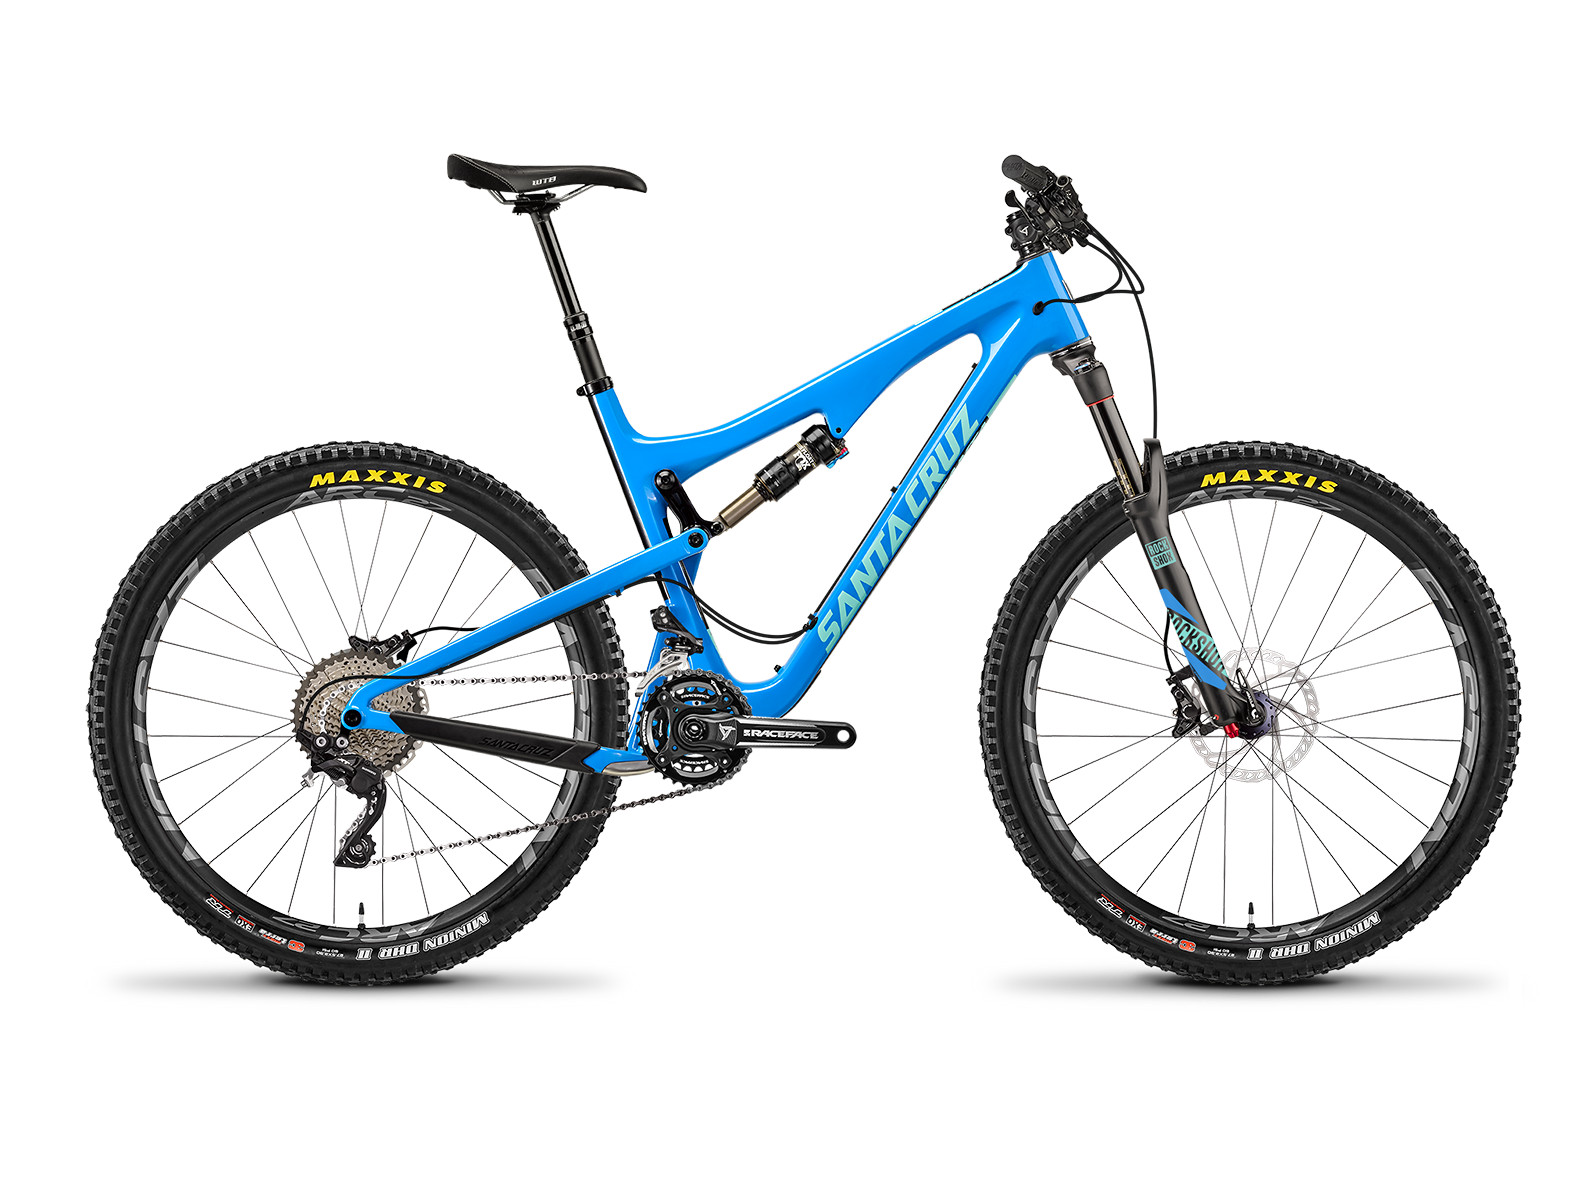 1596x1202 2016 Santa Cruz 5010 Carbon Cc Xt Bike